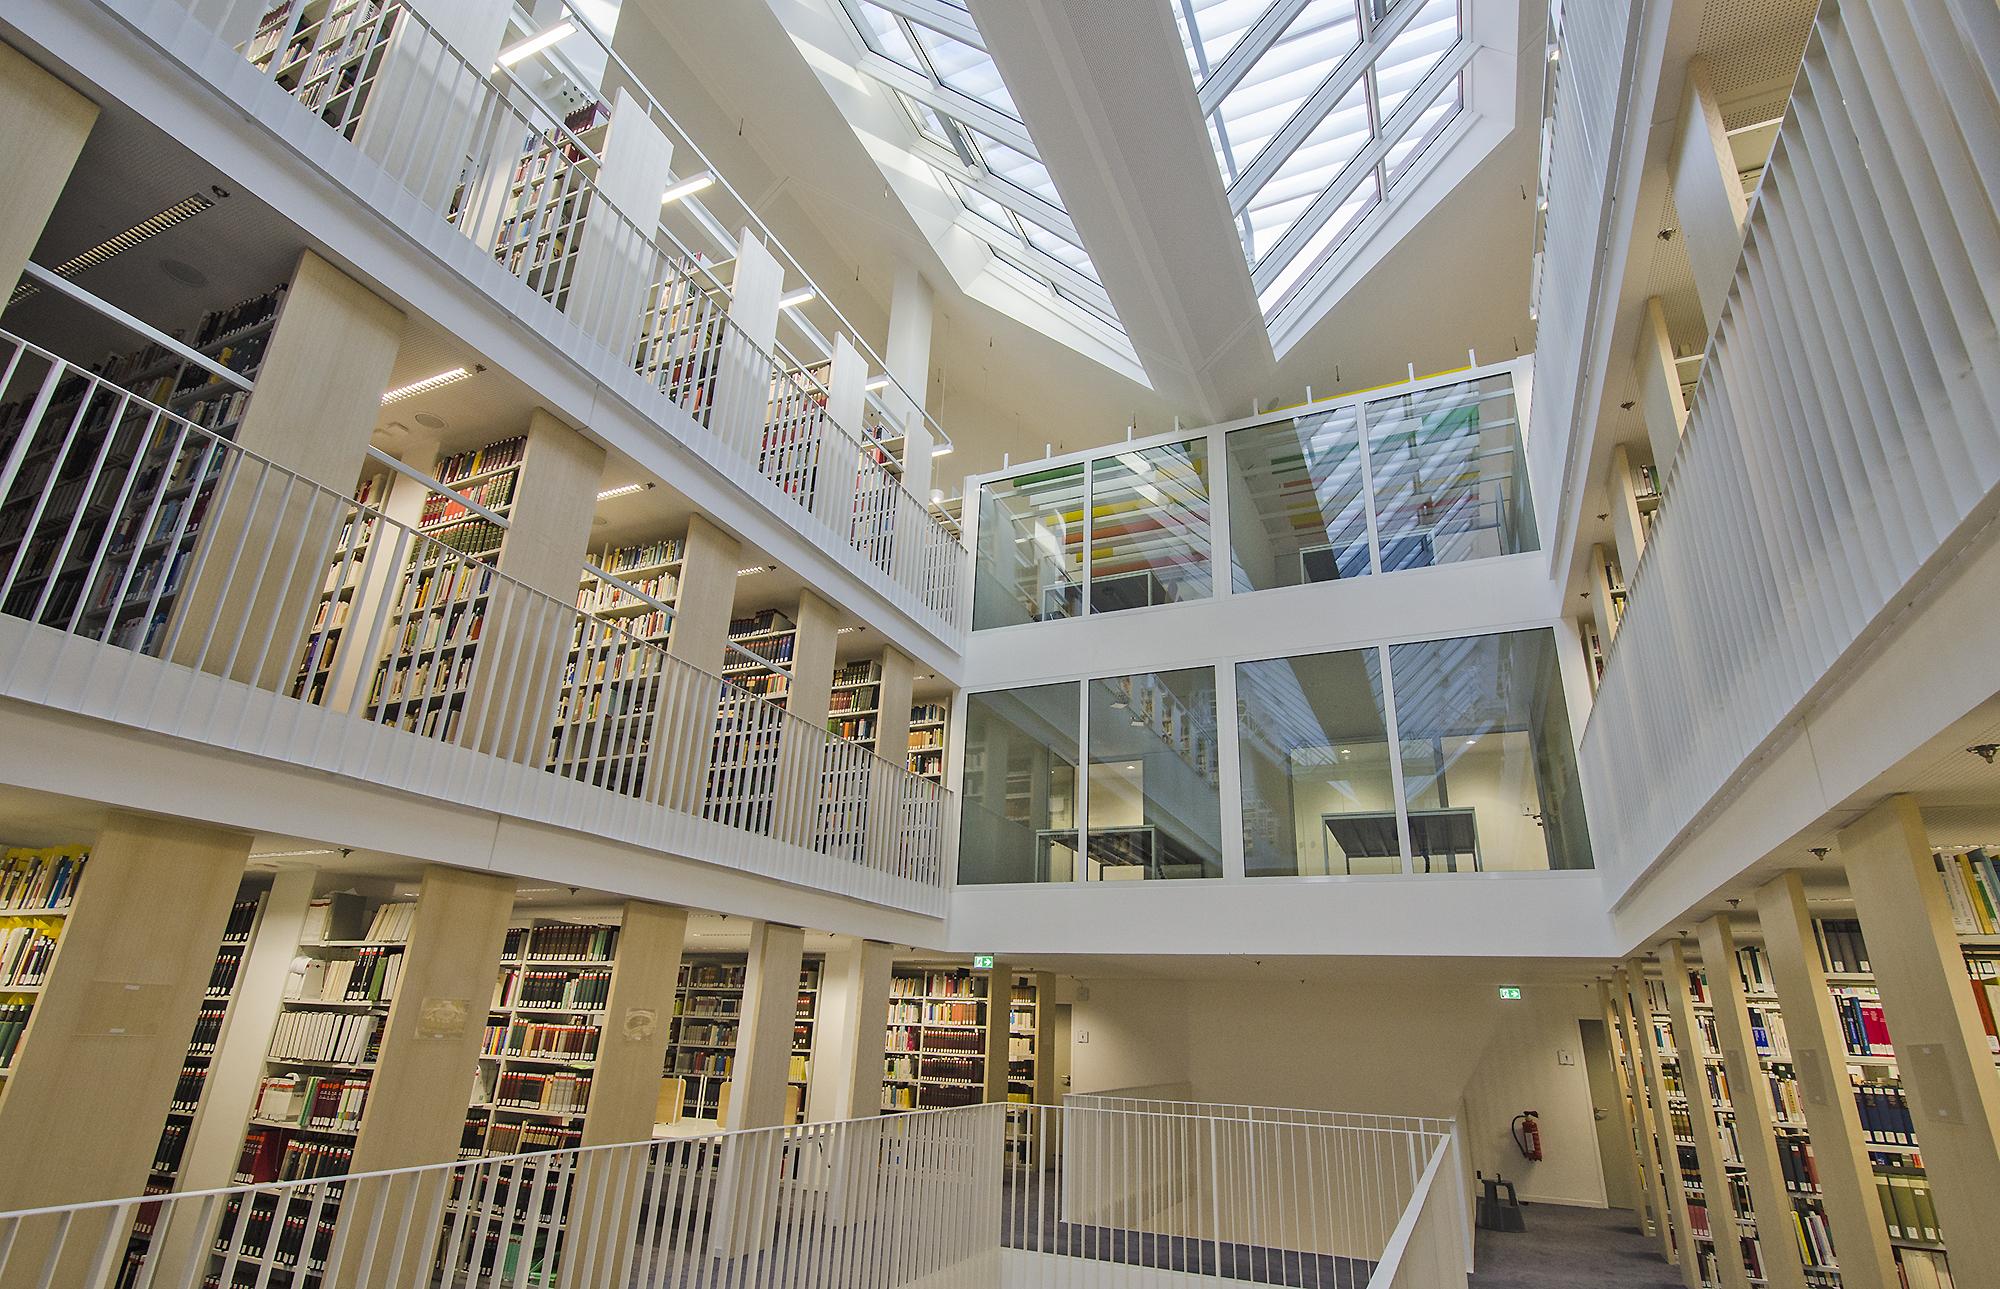 bereichsbibliothek universitt greifswald - Uni Greifswald Bewerbung